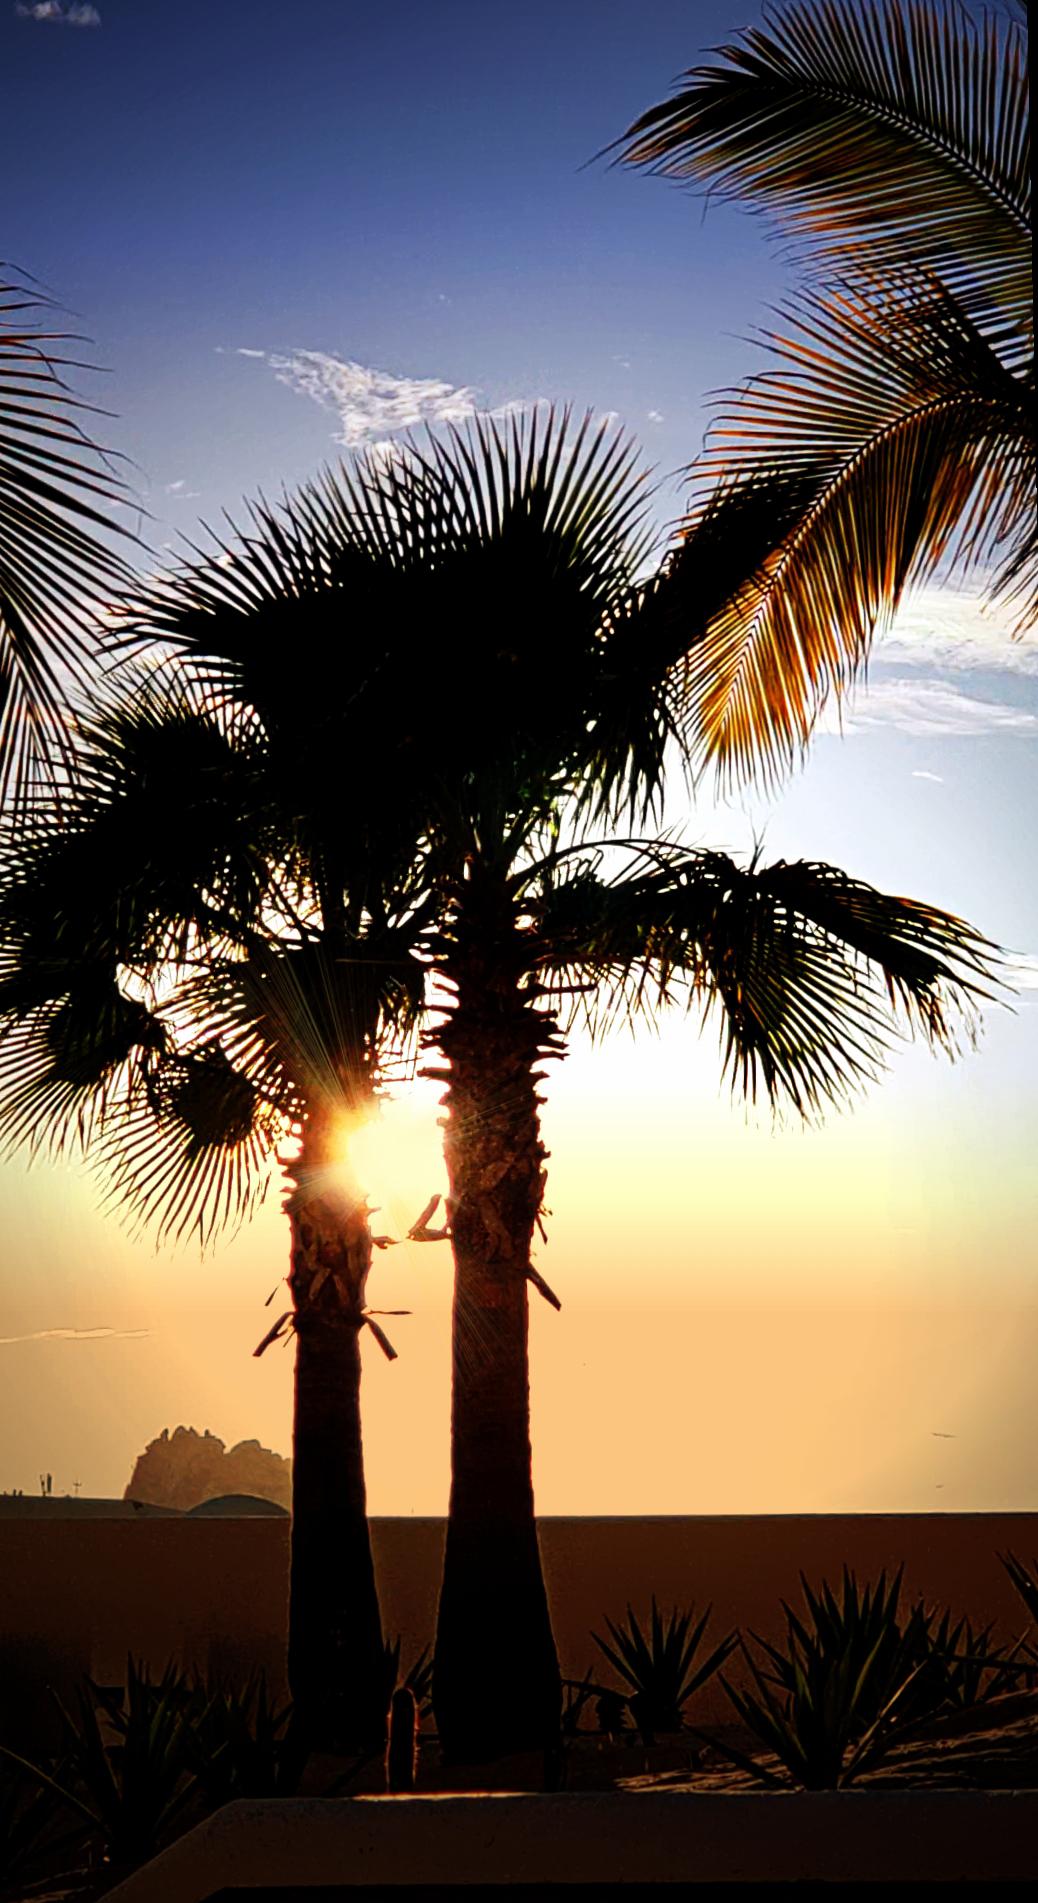 00-palmtrees-cabo-backlit-20180401_184503_A